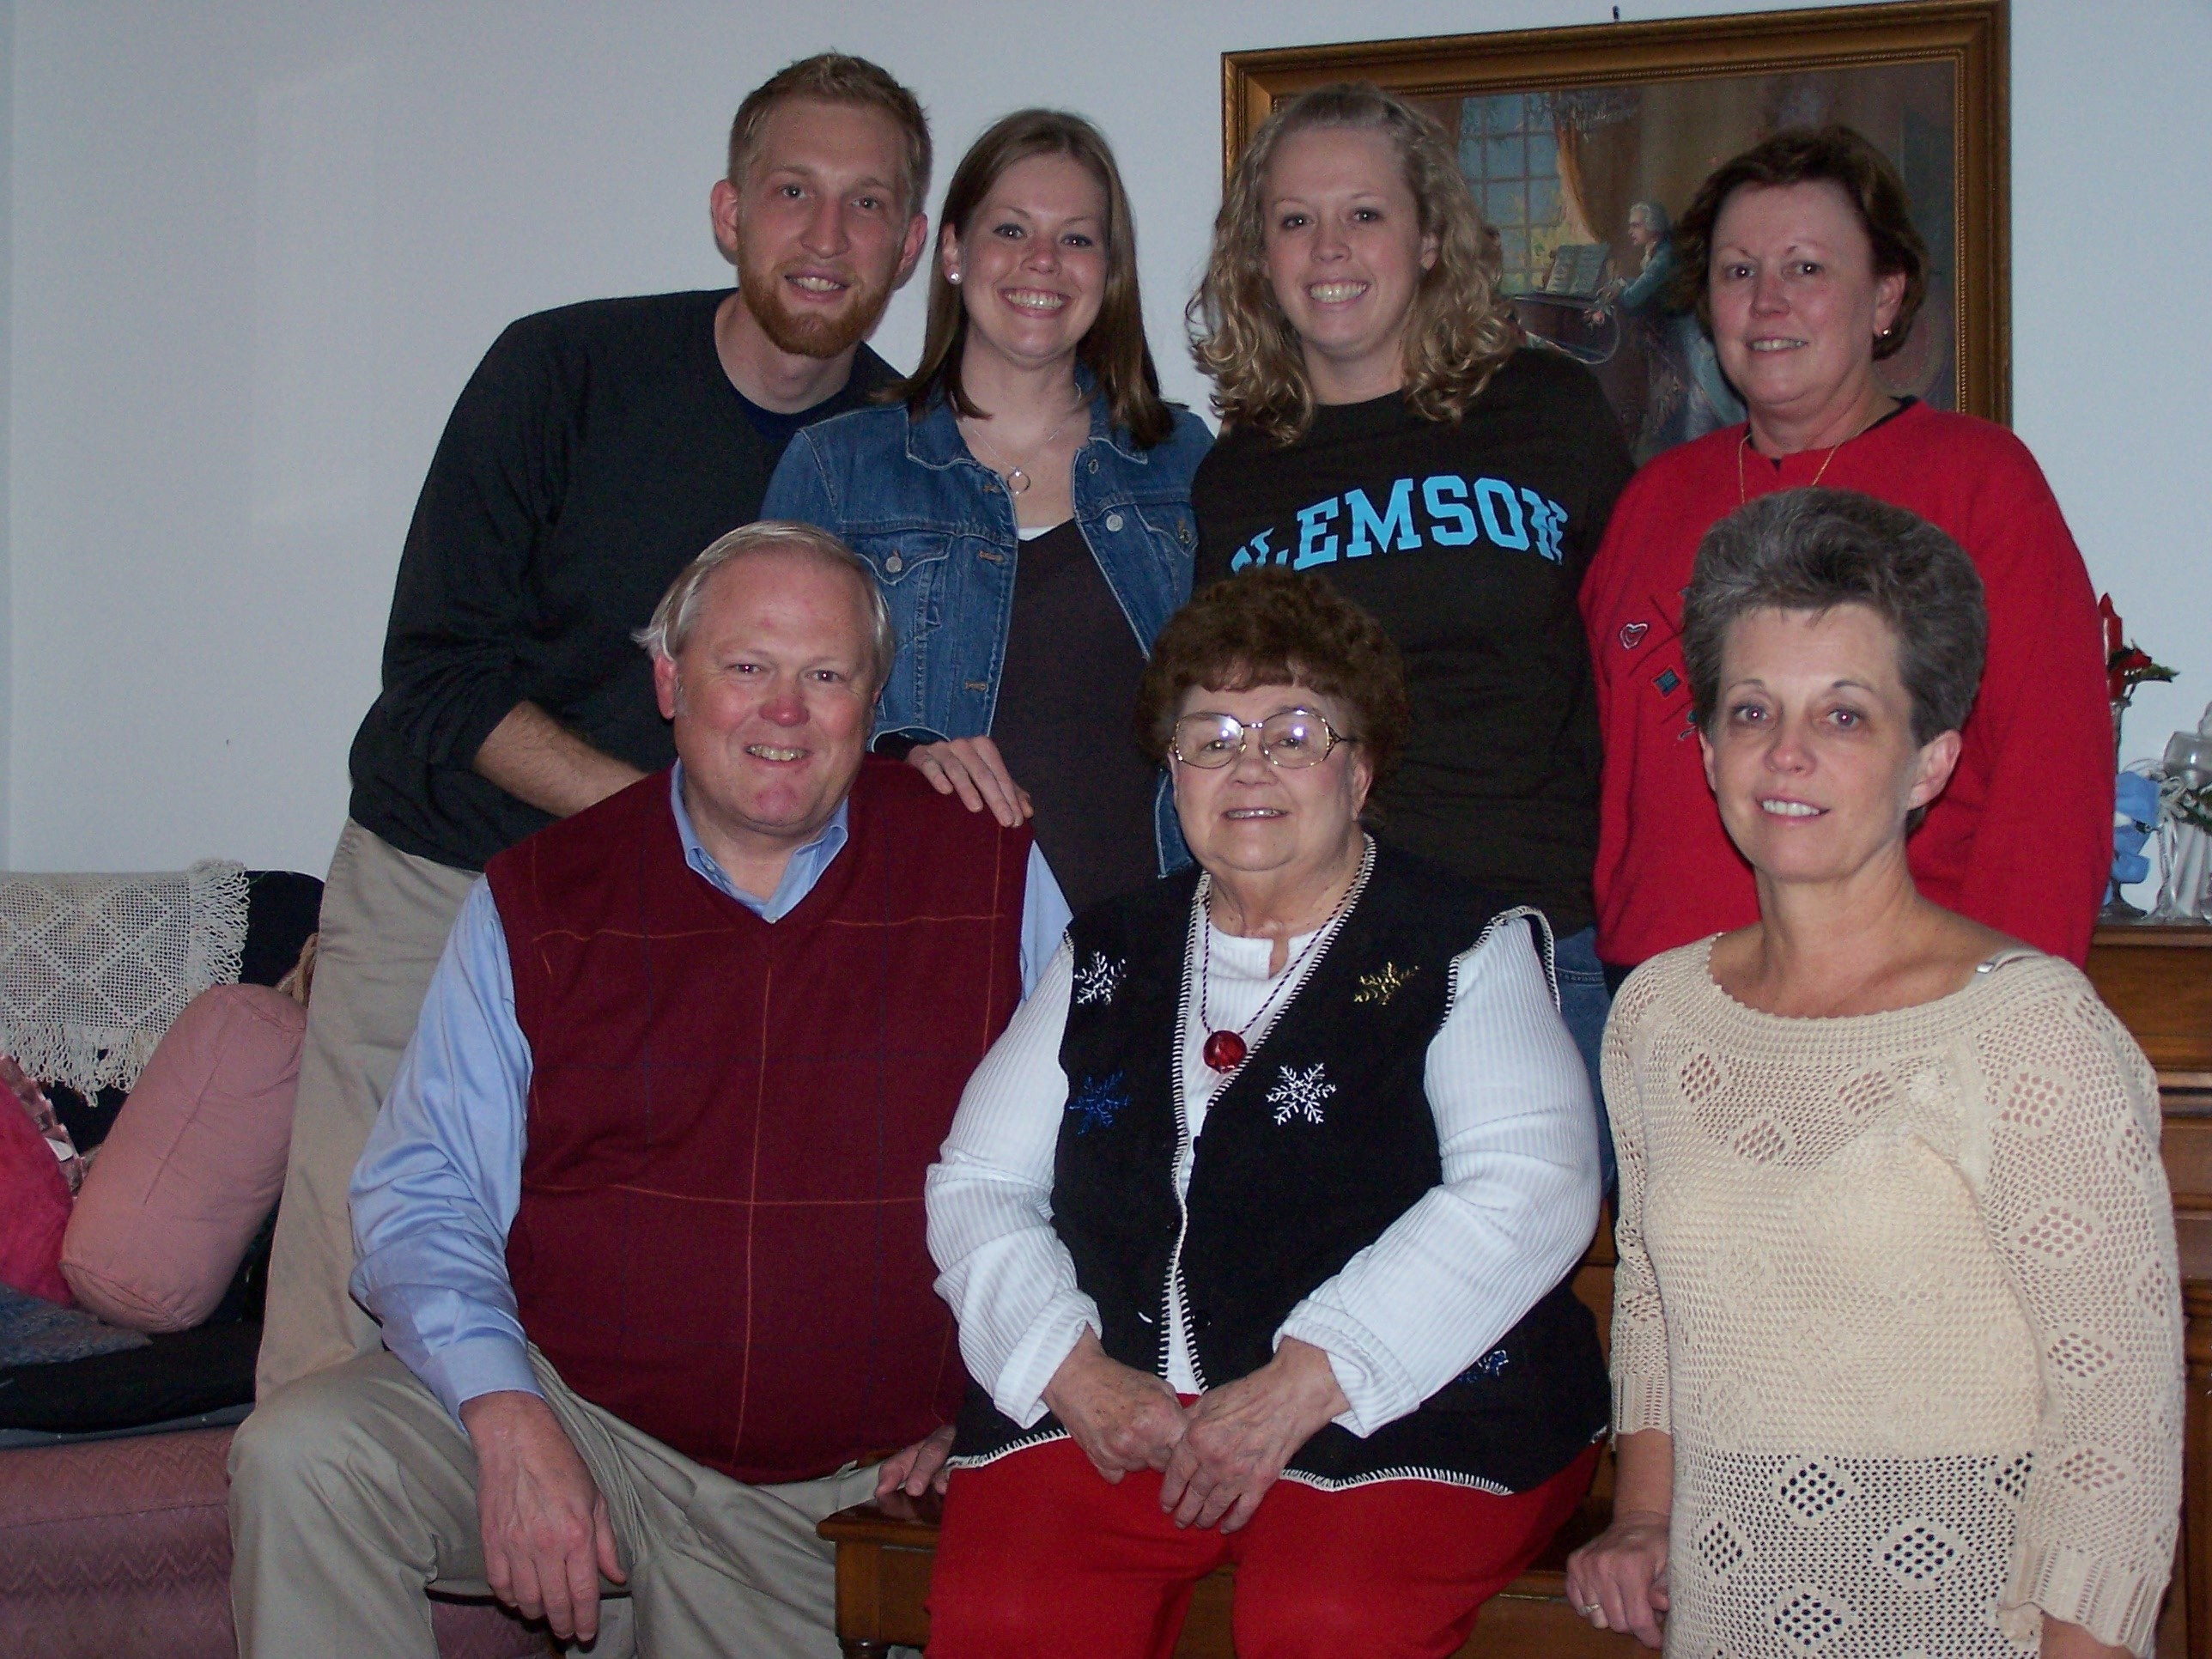 Grandma Benton with her children and grandchildren.